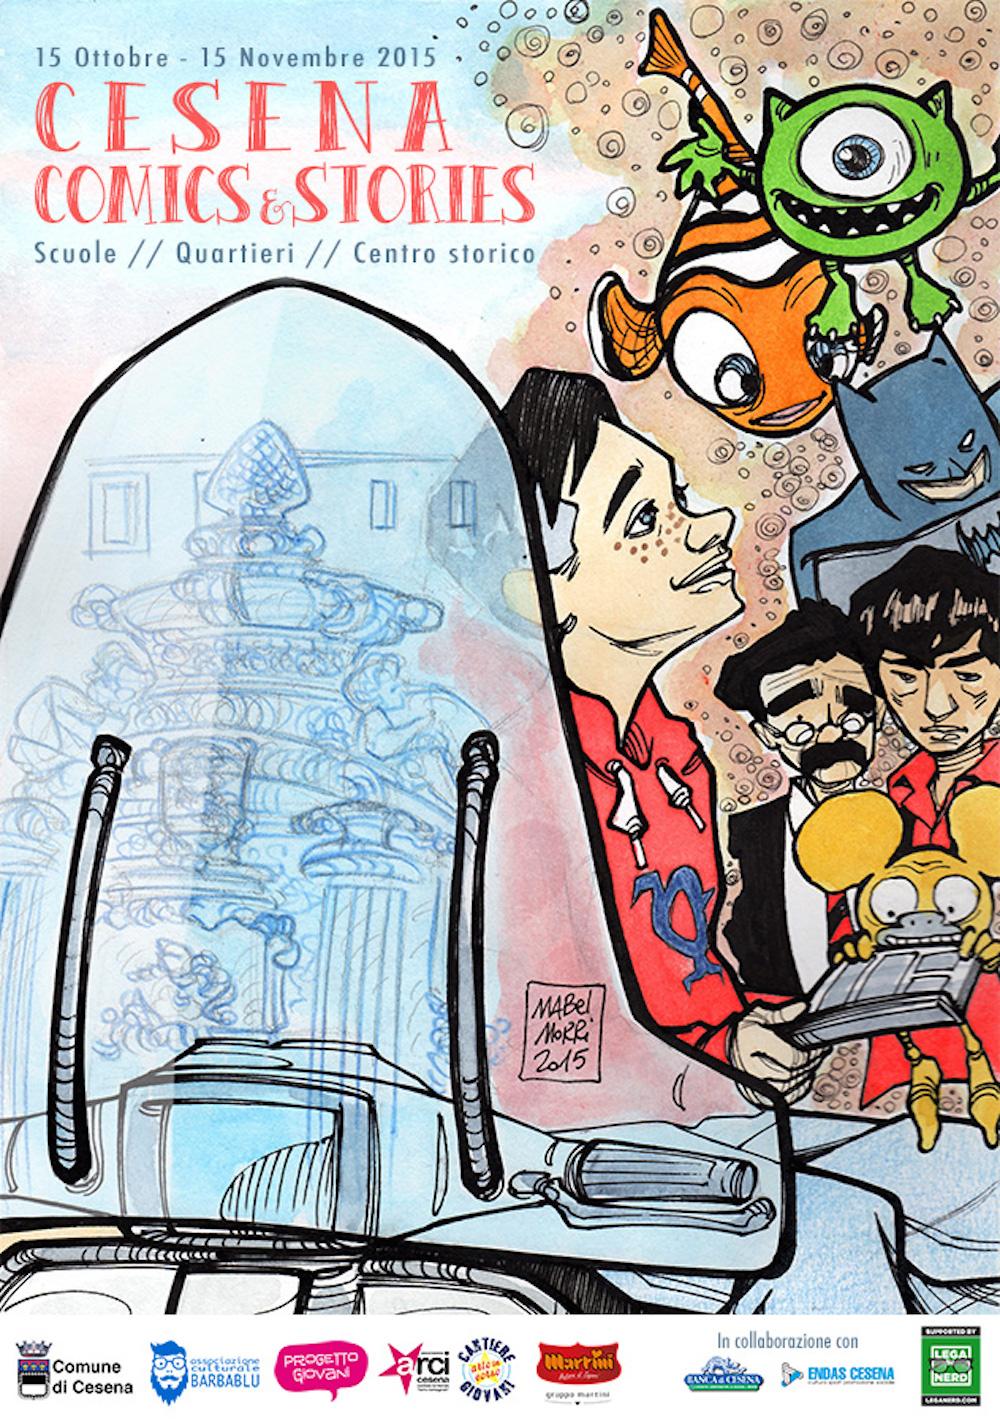 Cesena Comics & Stories 2015